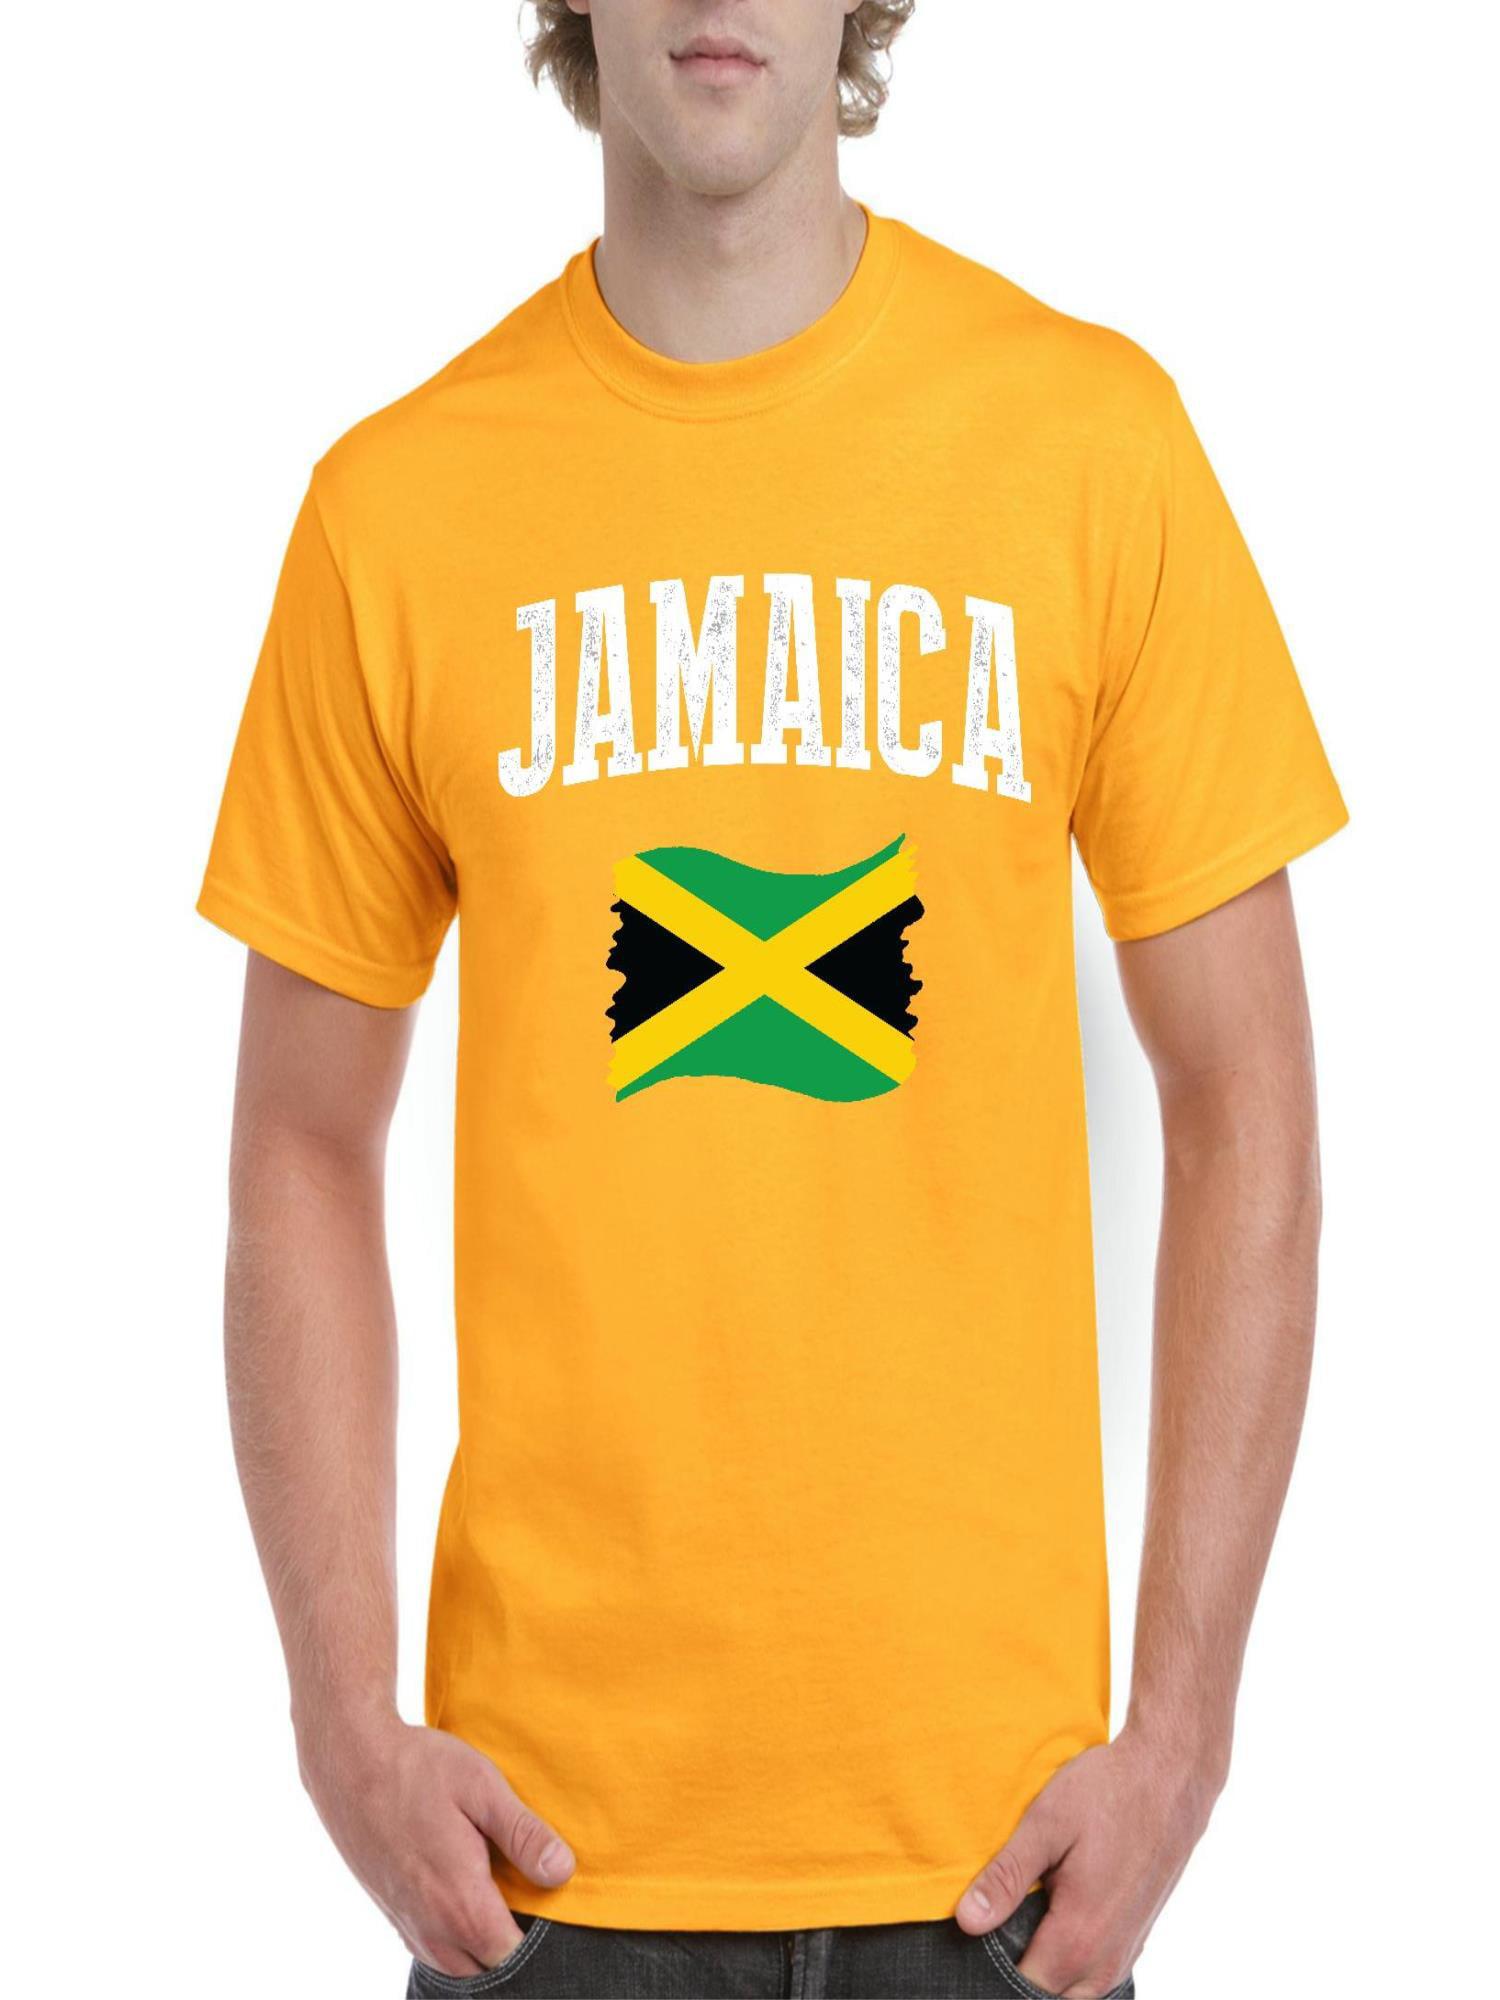 Blackout Tees Safty Orange and Yellow Long Sleeve American USA Made Tee T-Shirt